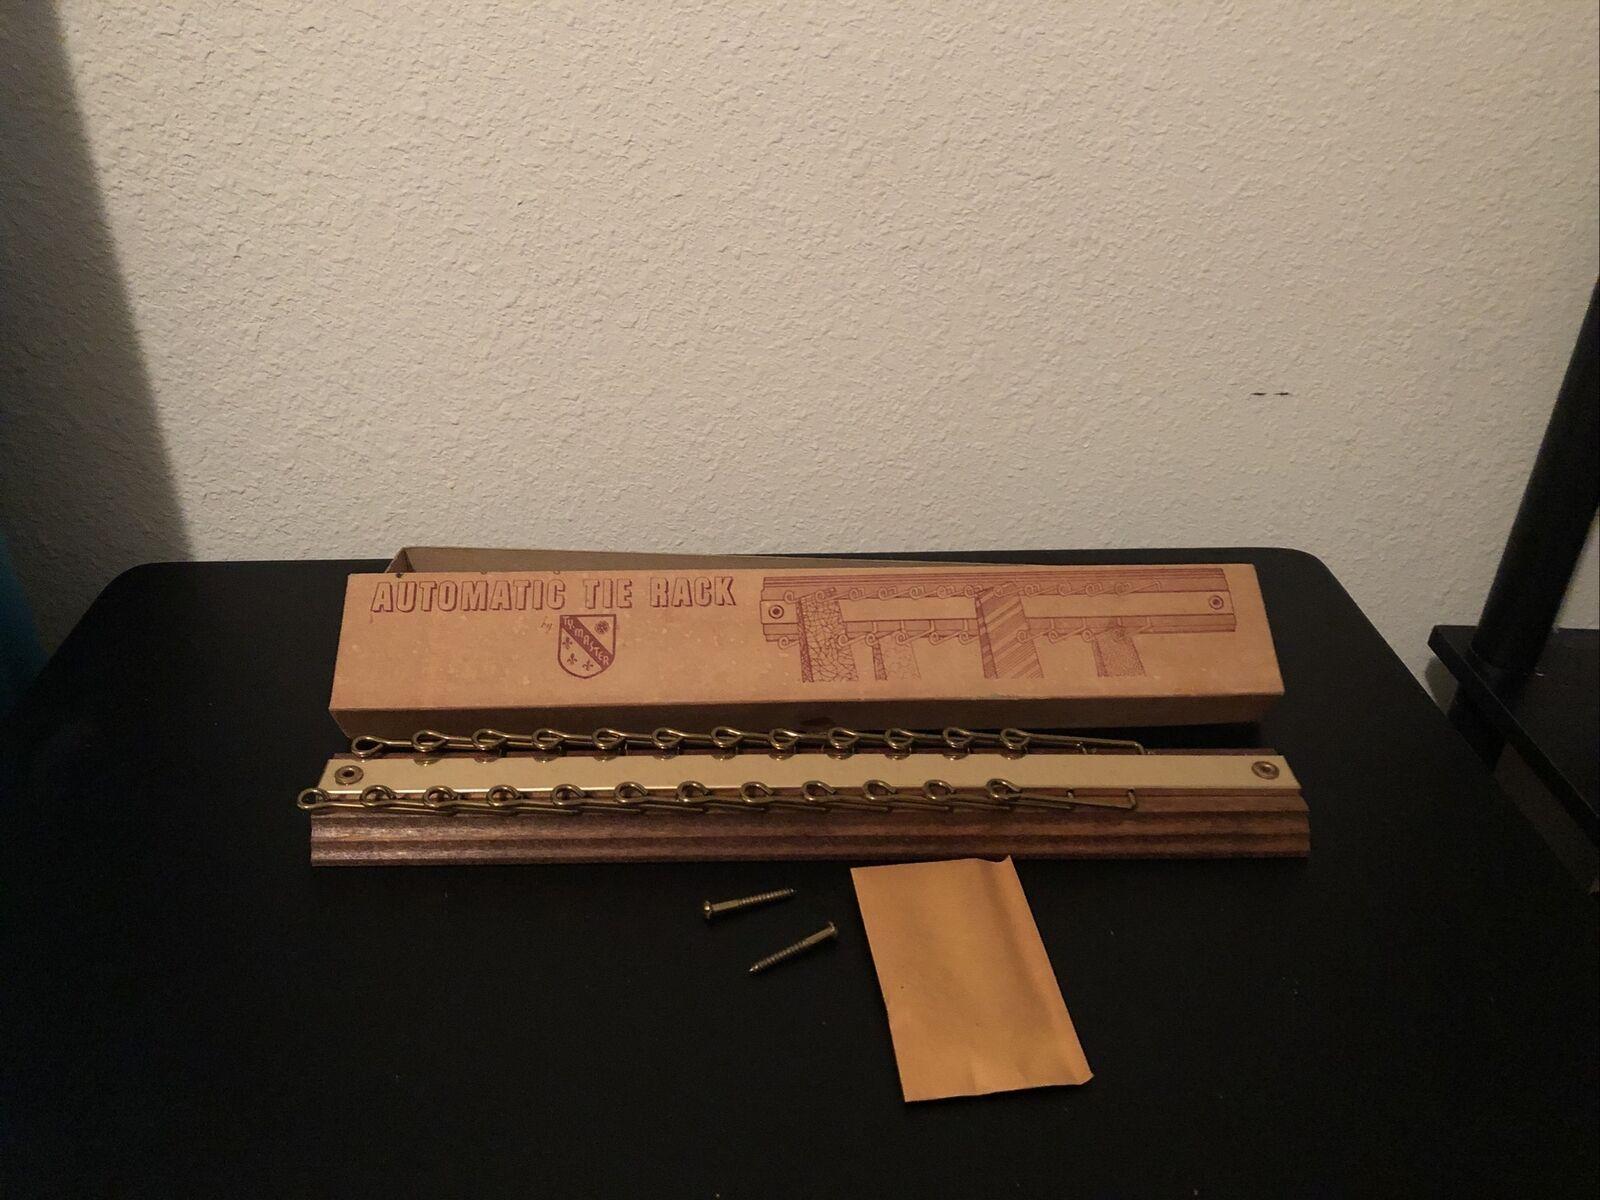 Vintage Mens Automatic tie rack Ty-Master Wood Metal Foldable Never Used